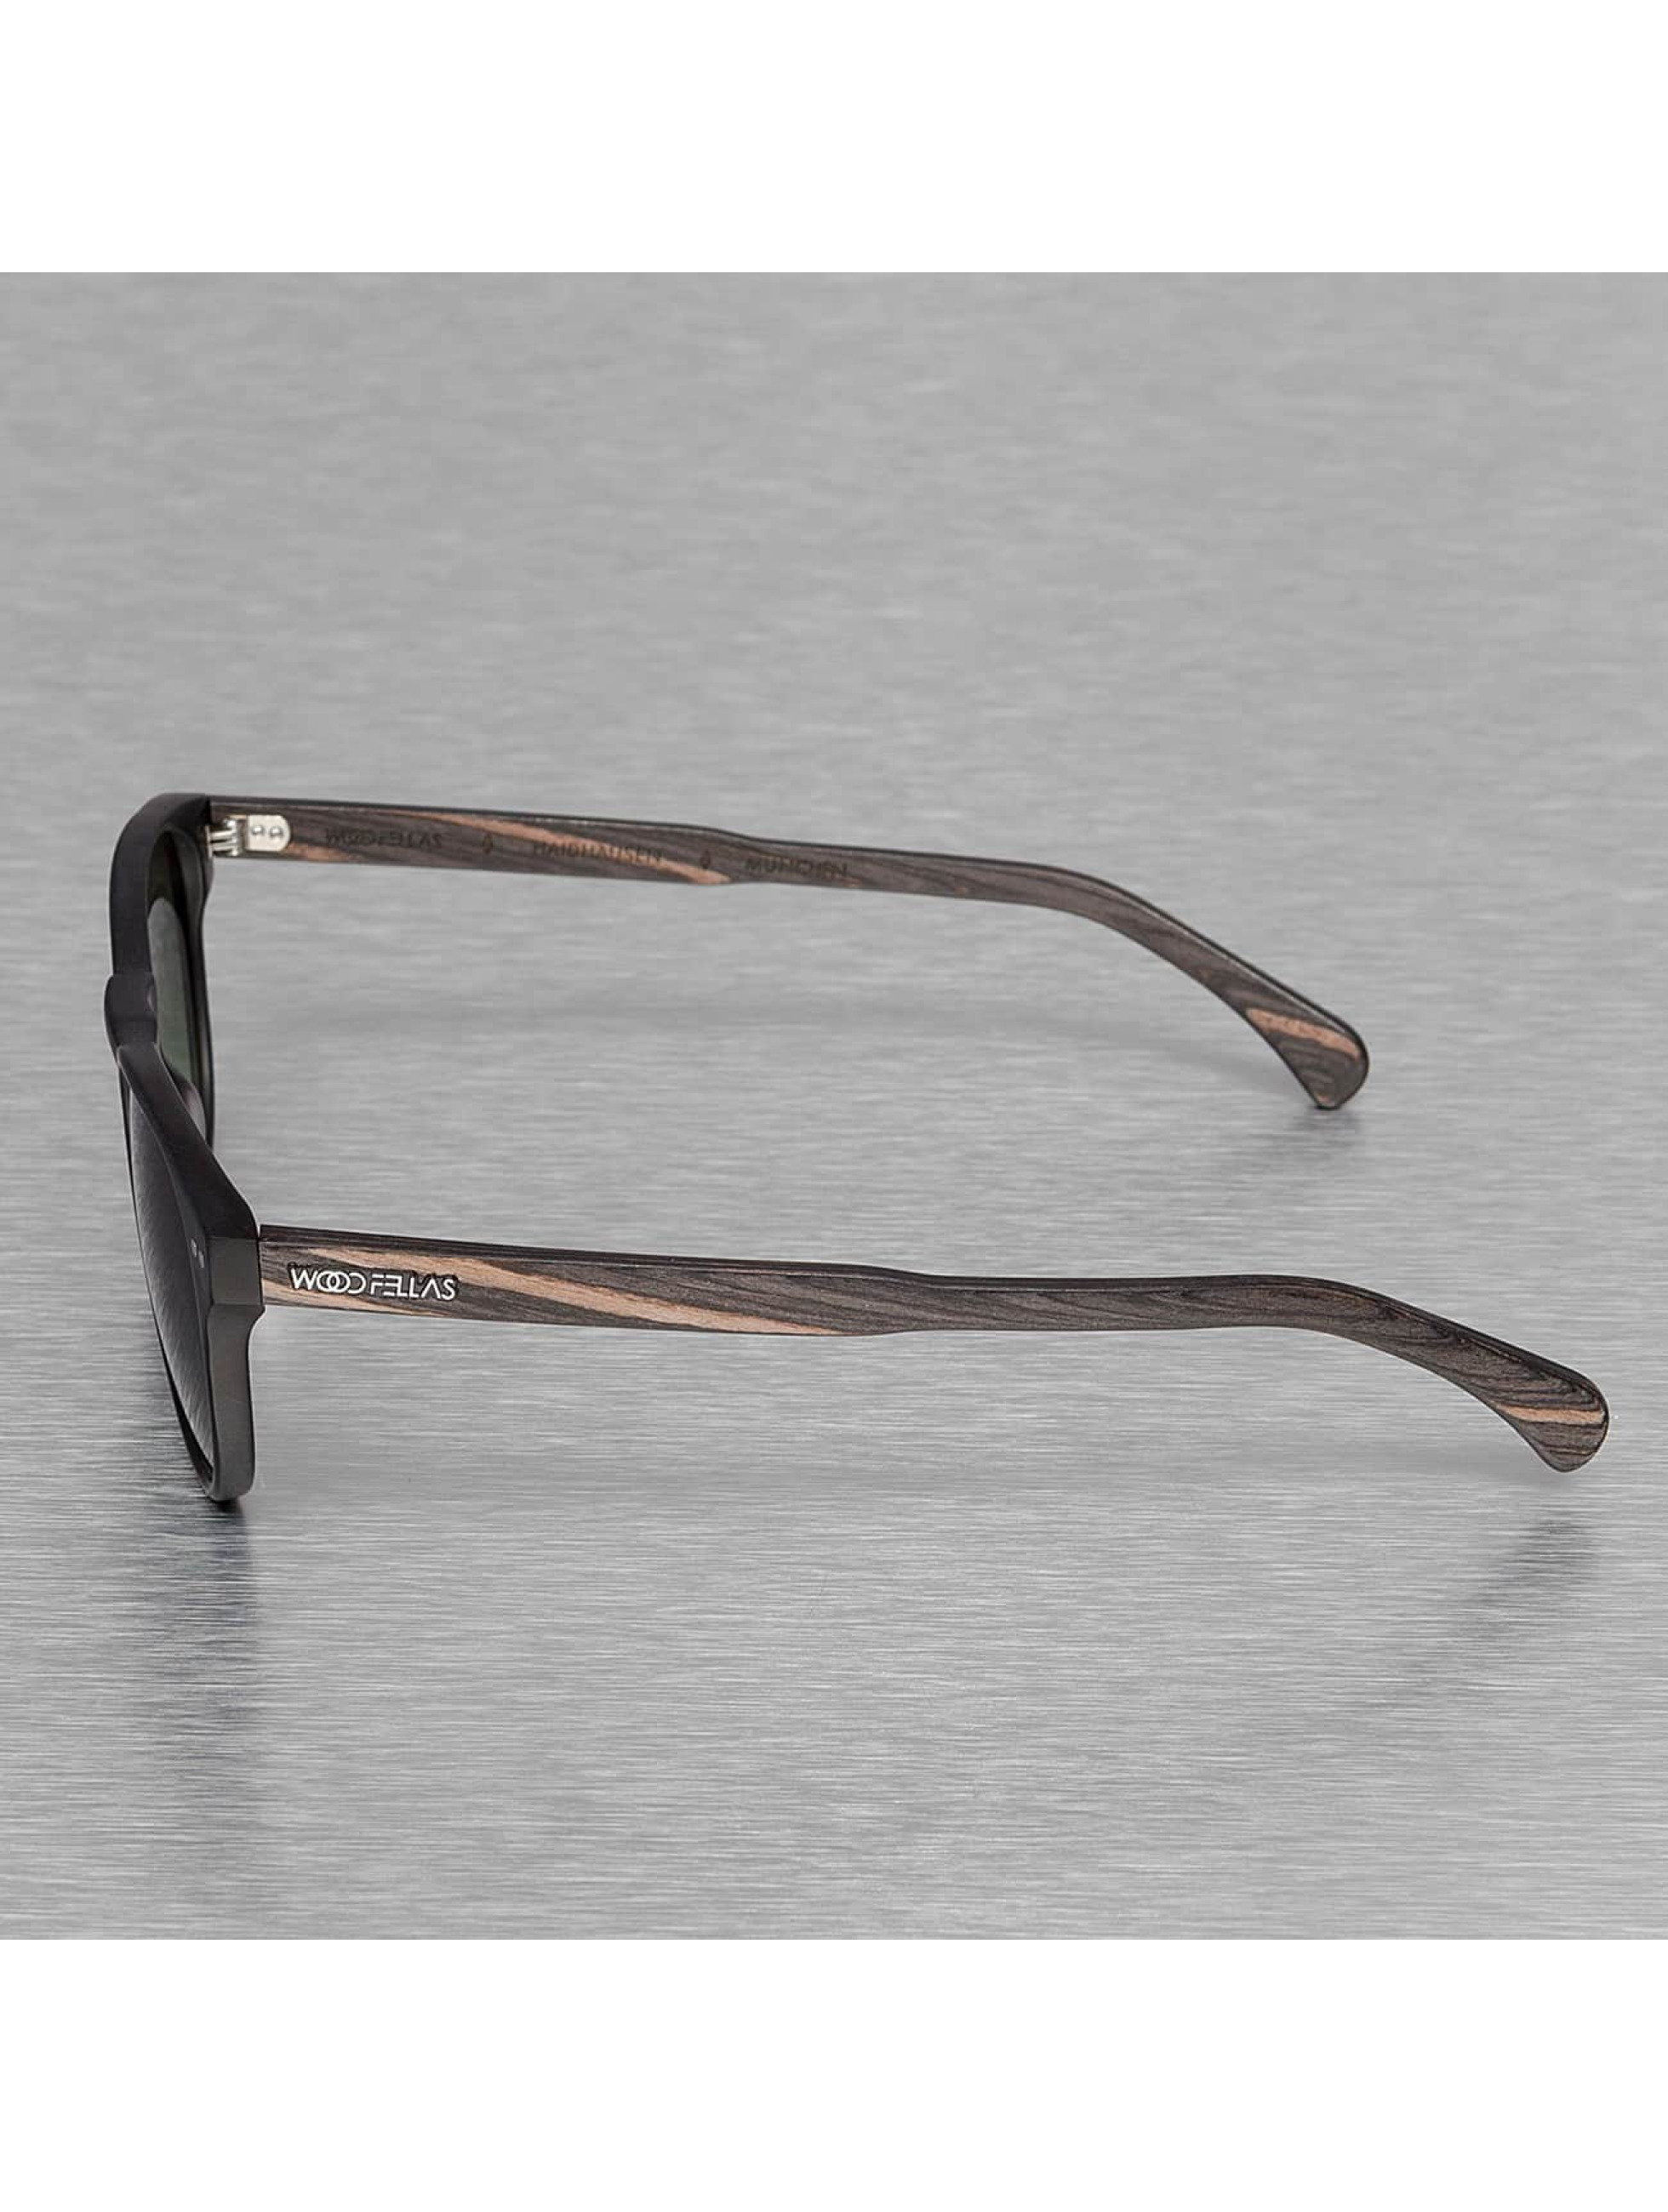 Wood Fellas Eyewear Очки Eyewear Haidhausen Polarized Mirror черный